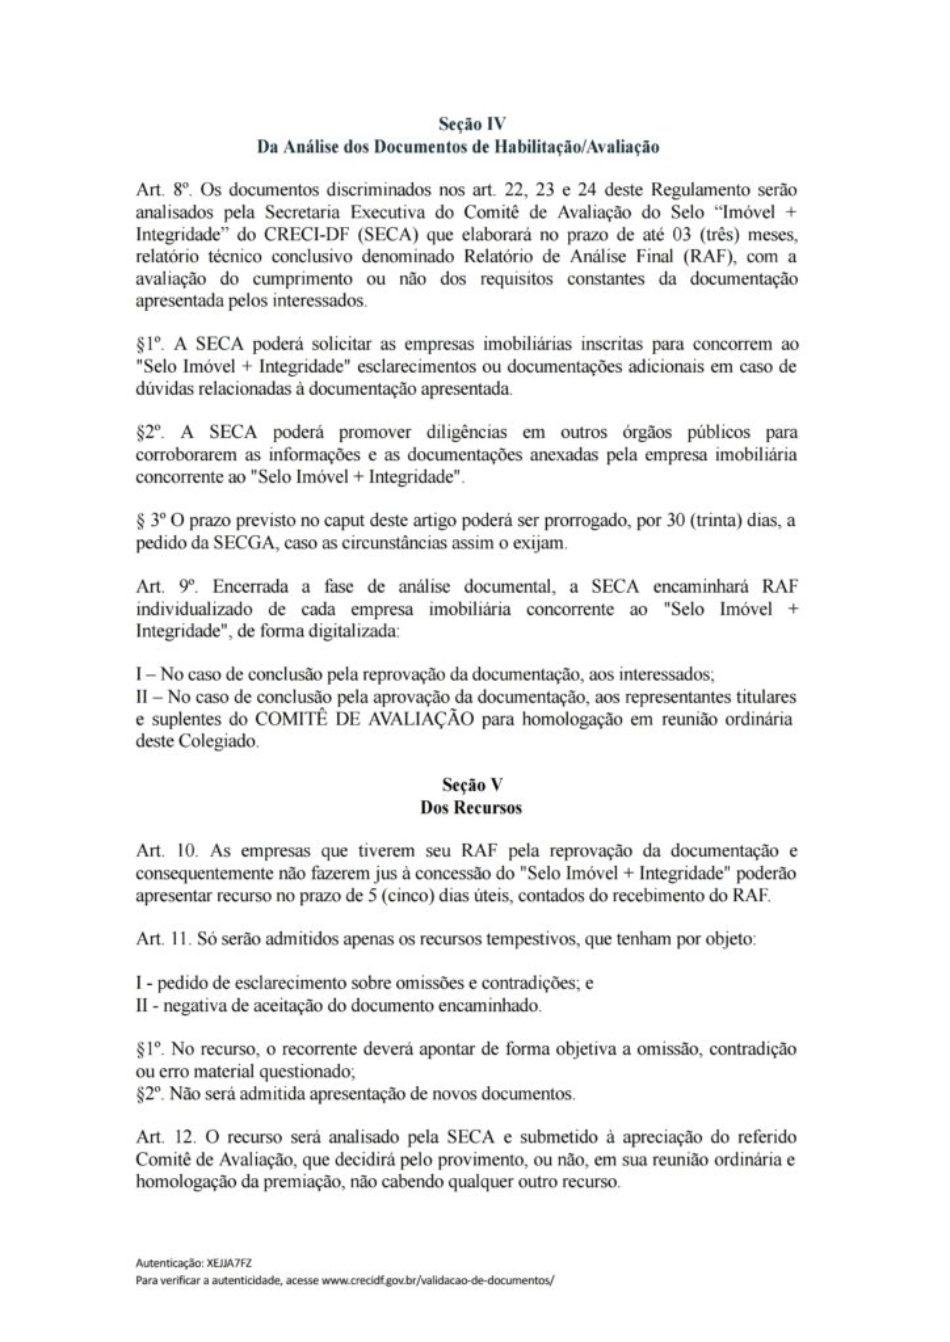 PORTARIA Nº 58 - SELO IMÓVEL + INTEGRIDADE.pdf_page_05